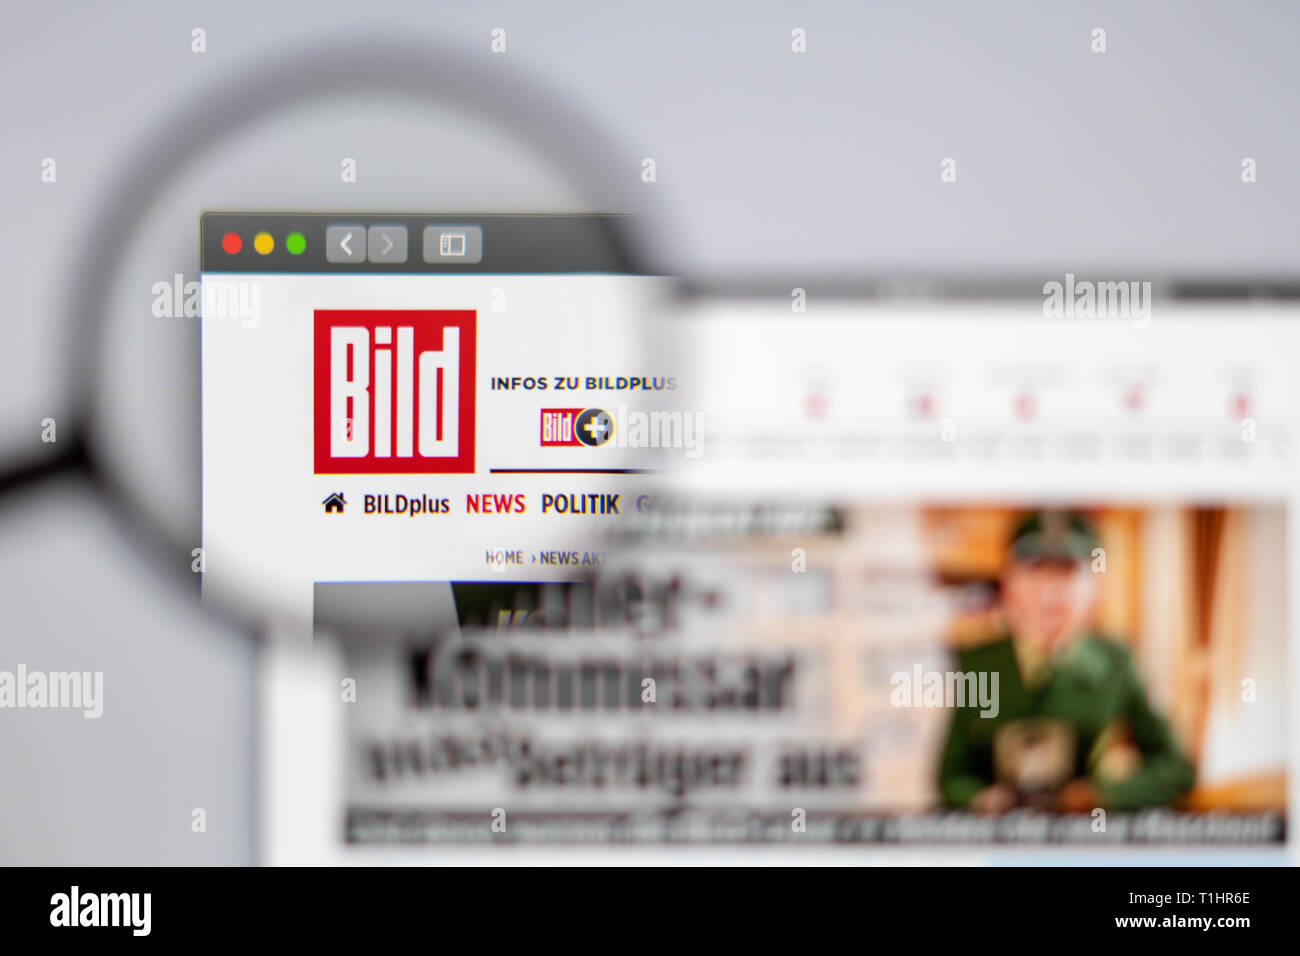 Germany news media Bild website homepage. Bild logo visible  through a magnifying glass. - Stock Image